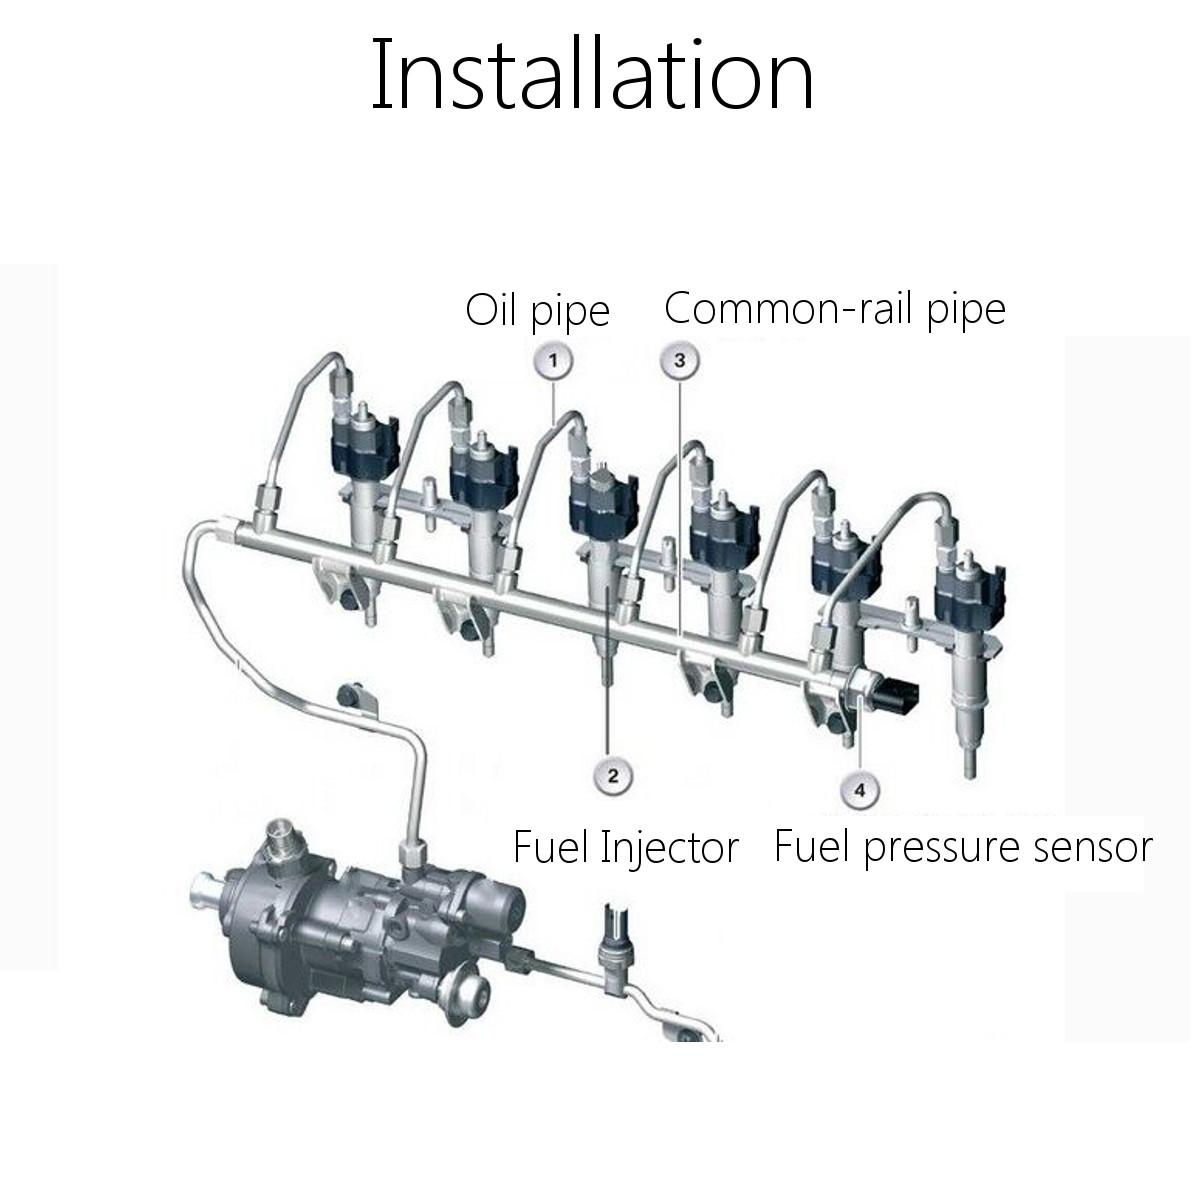 7 3 Fuel Injector